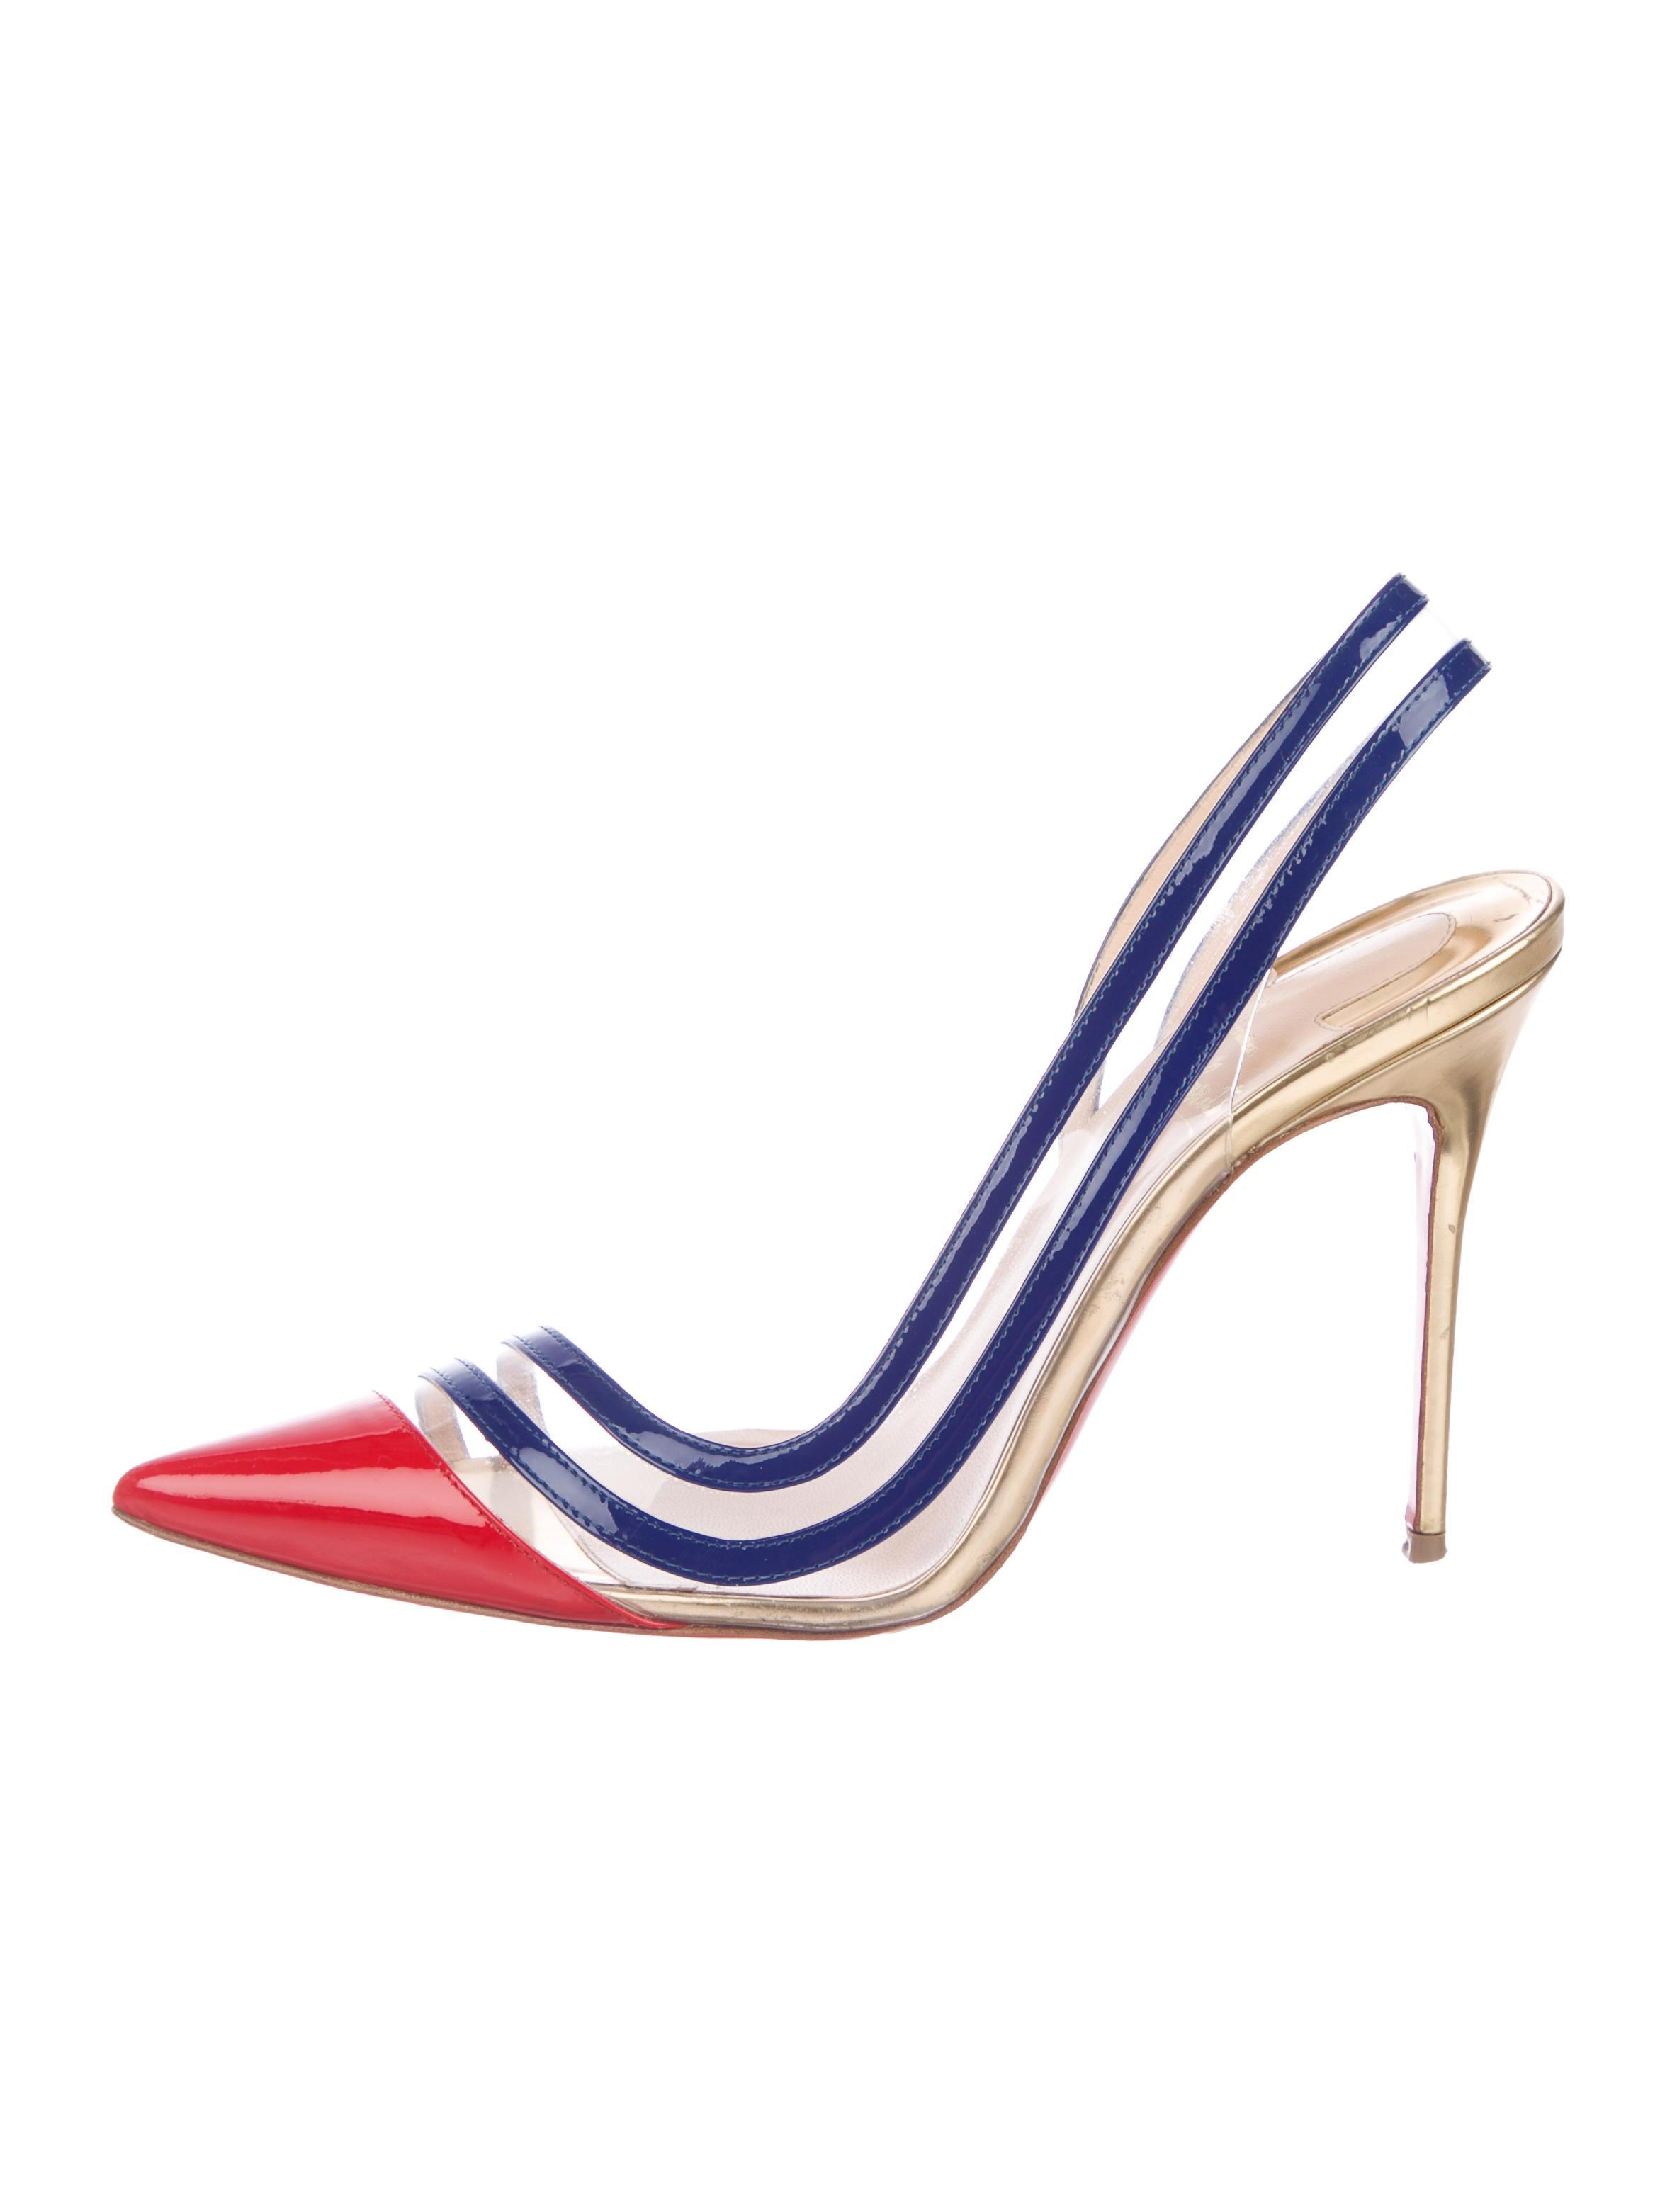 1d5b0b73dd Christian Louboutin Paralili PVC 100 Pumps - Shoes - CHT100972 | The  RealReal